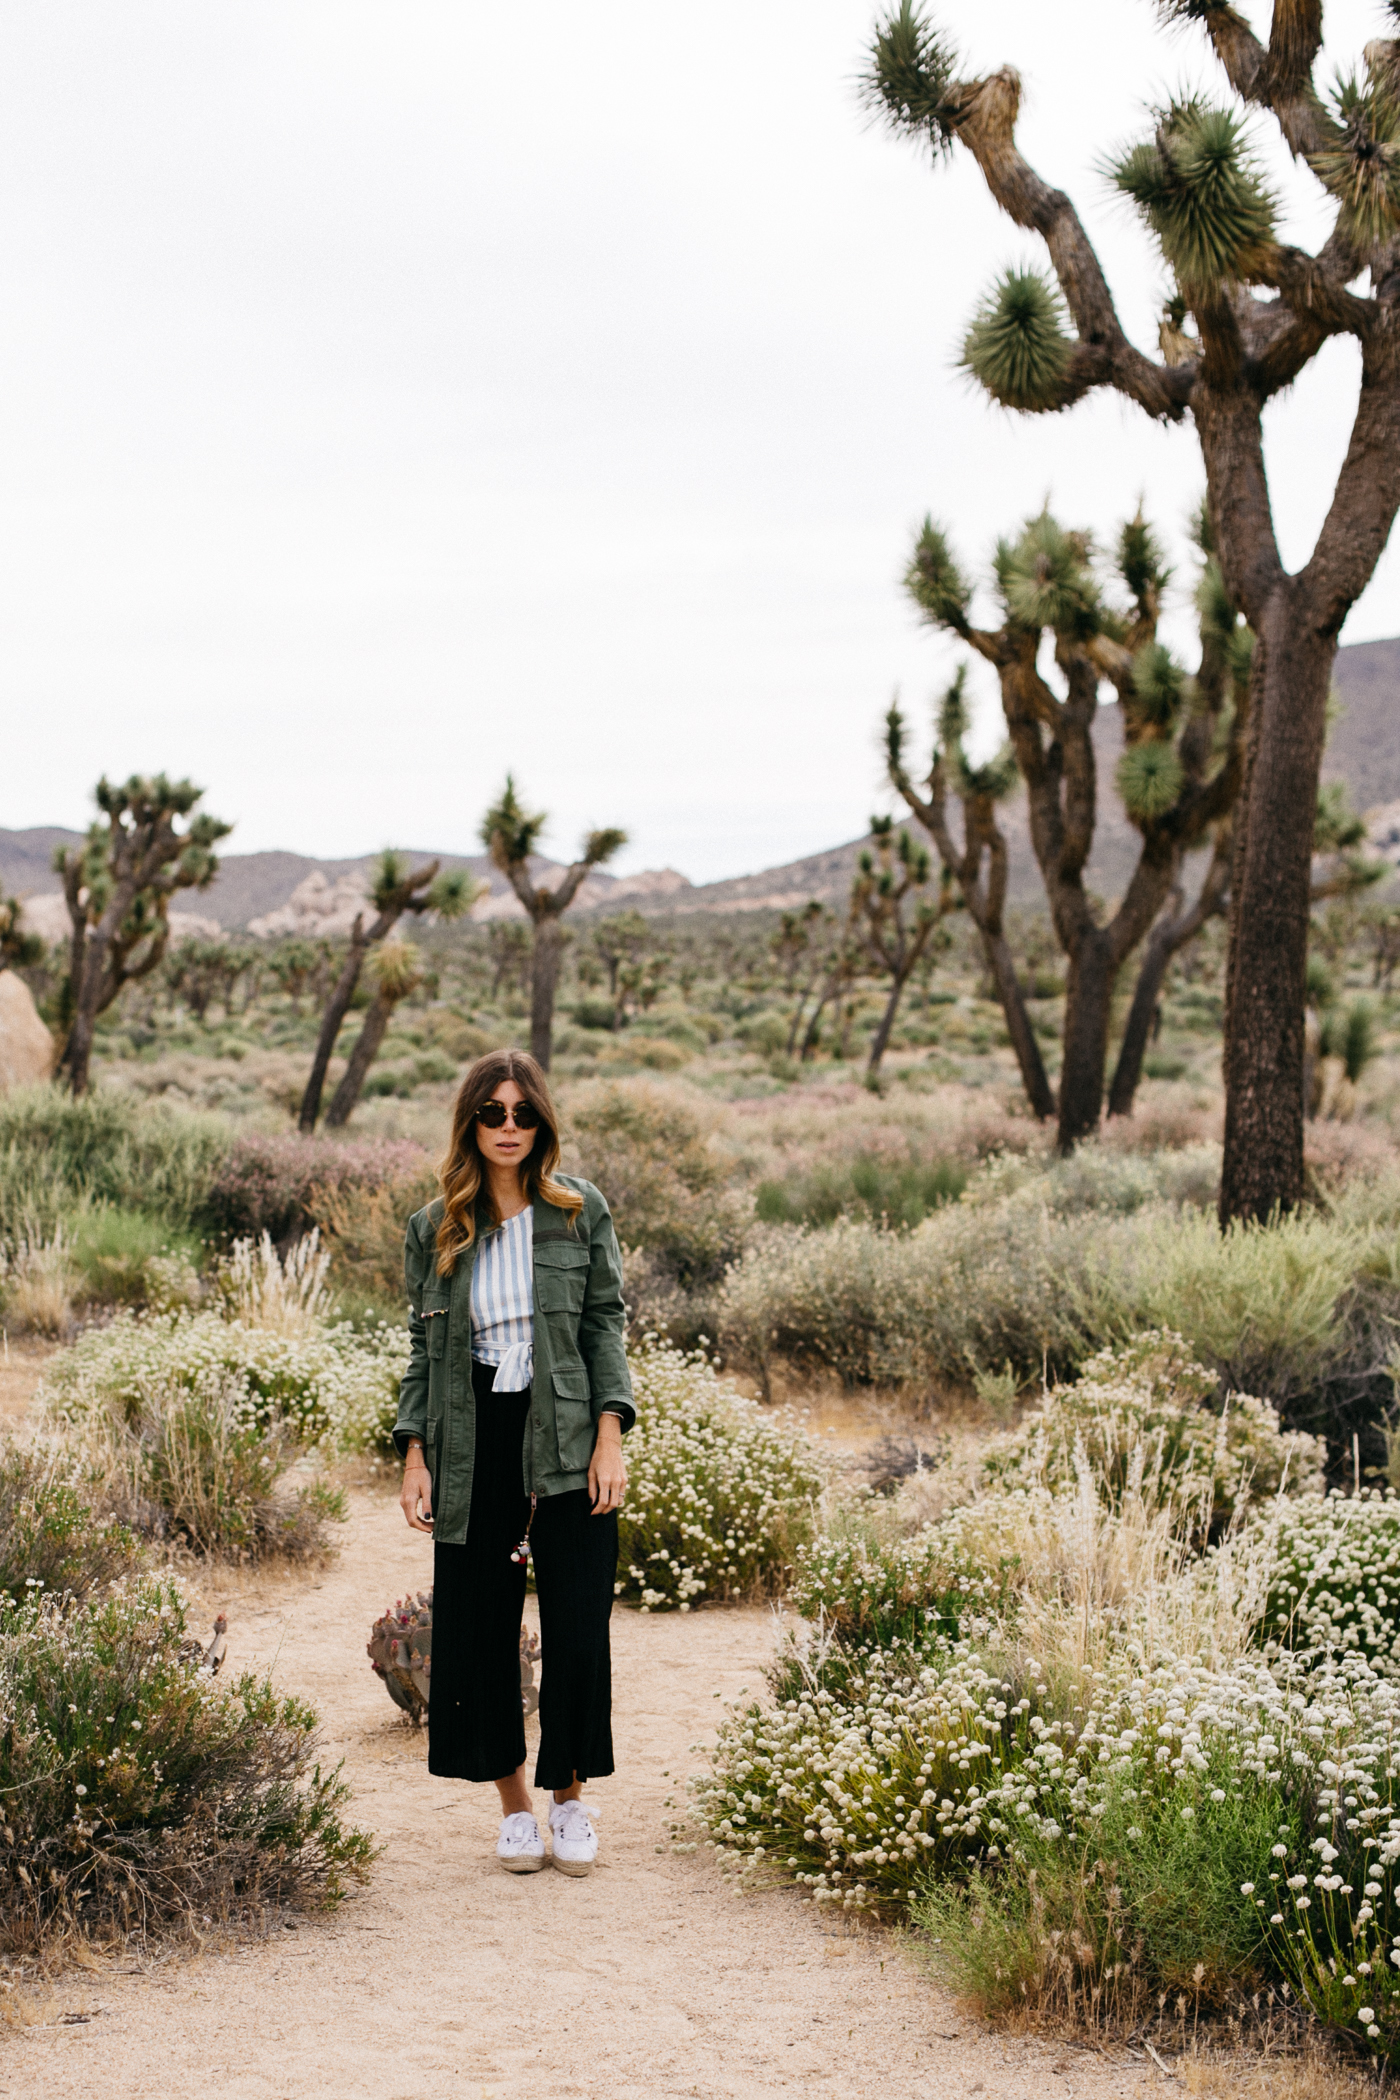 Joshua Tree National Park Outfit | Bikinis & Passports